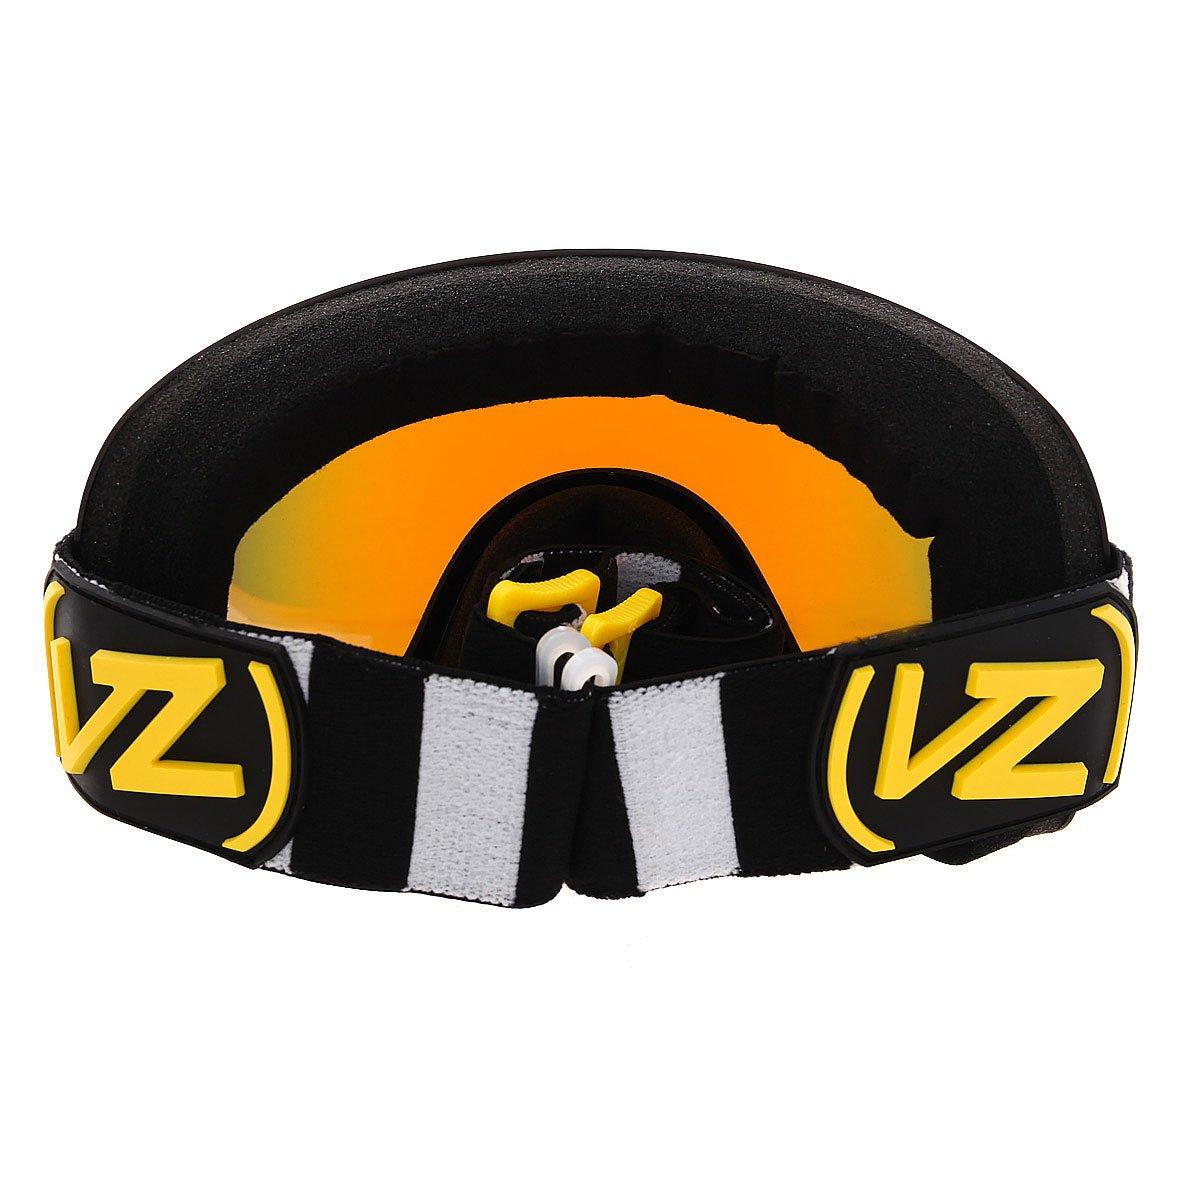 Маска для сноуборда Von Zipper Alt Wildlife Trudef Chrome